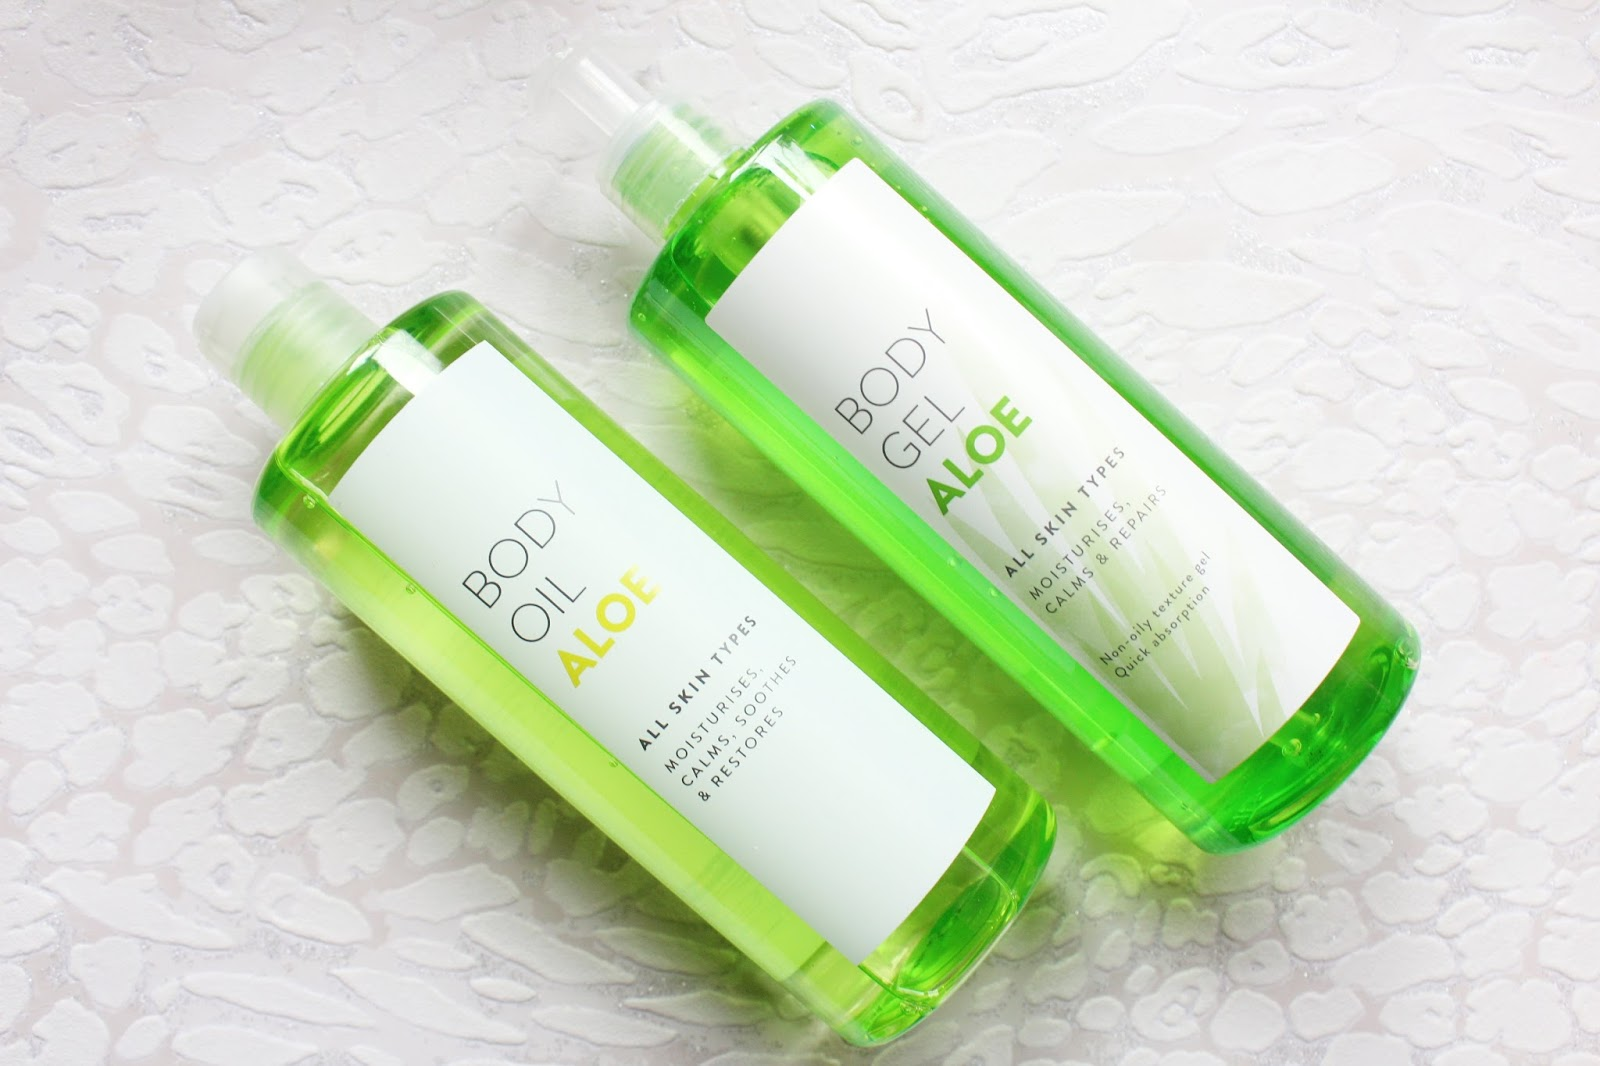 Tesco Aloe Skincare Range